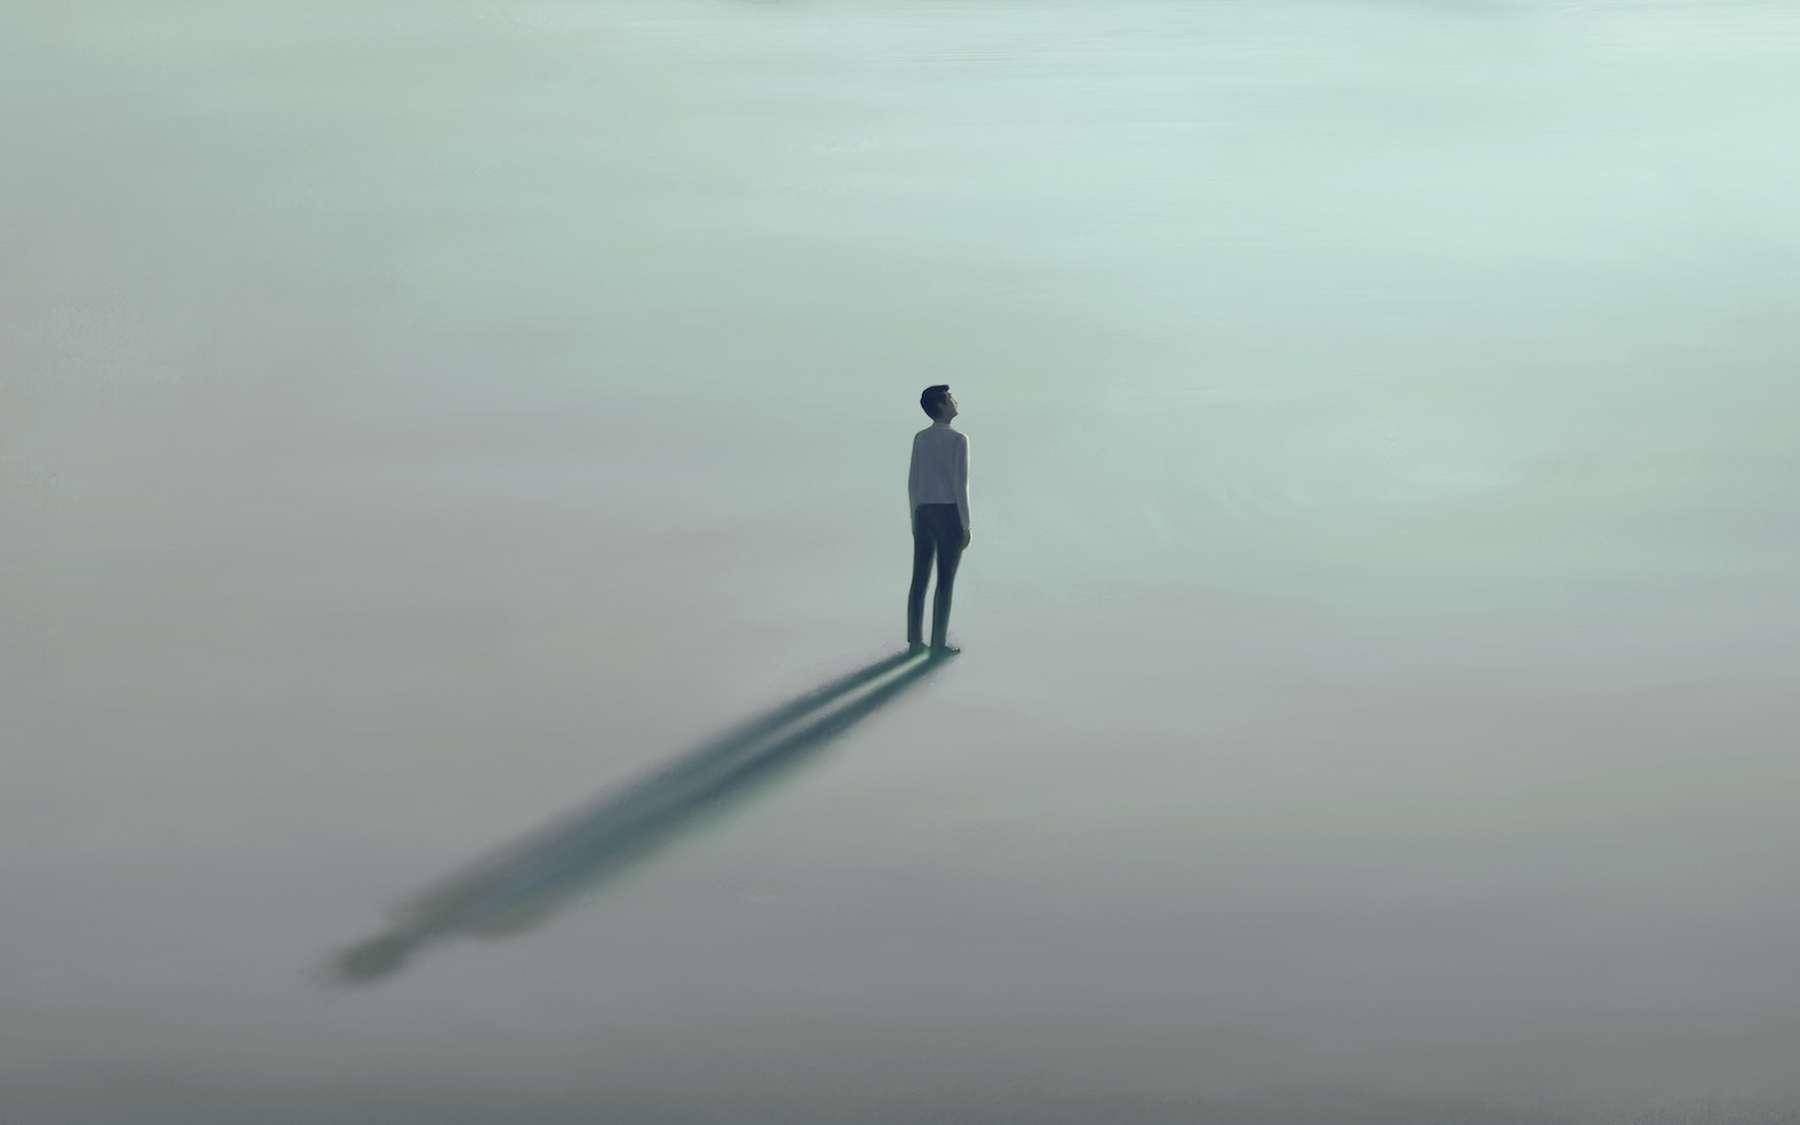 Surprenant : la solitude ferait grossir le cerveau ! - Futura